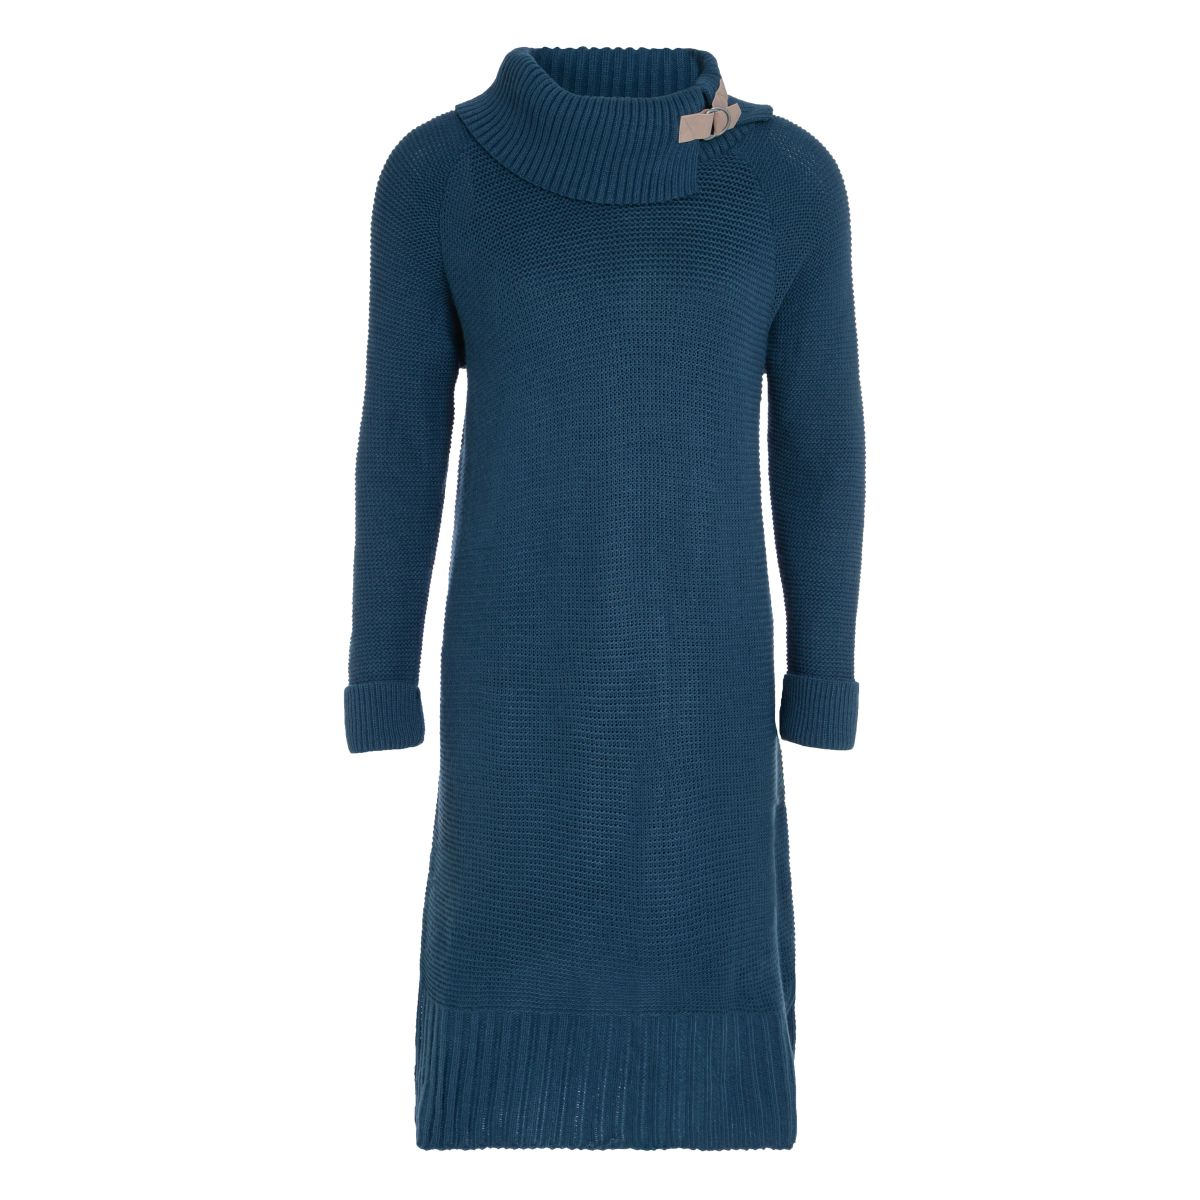 jamie knitted dress petrol 3638